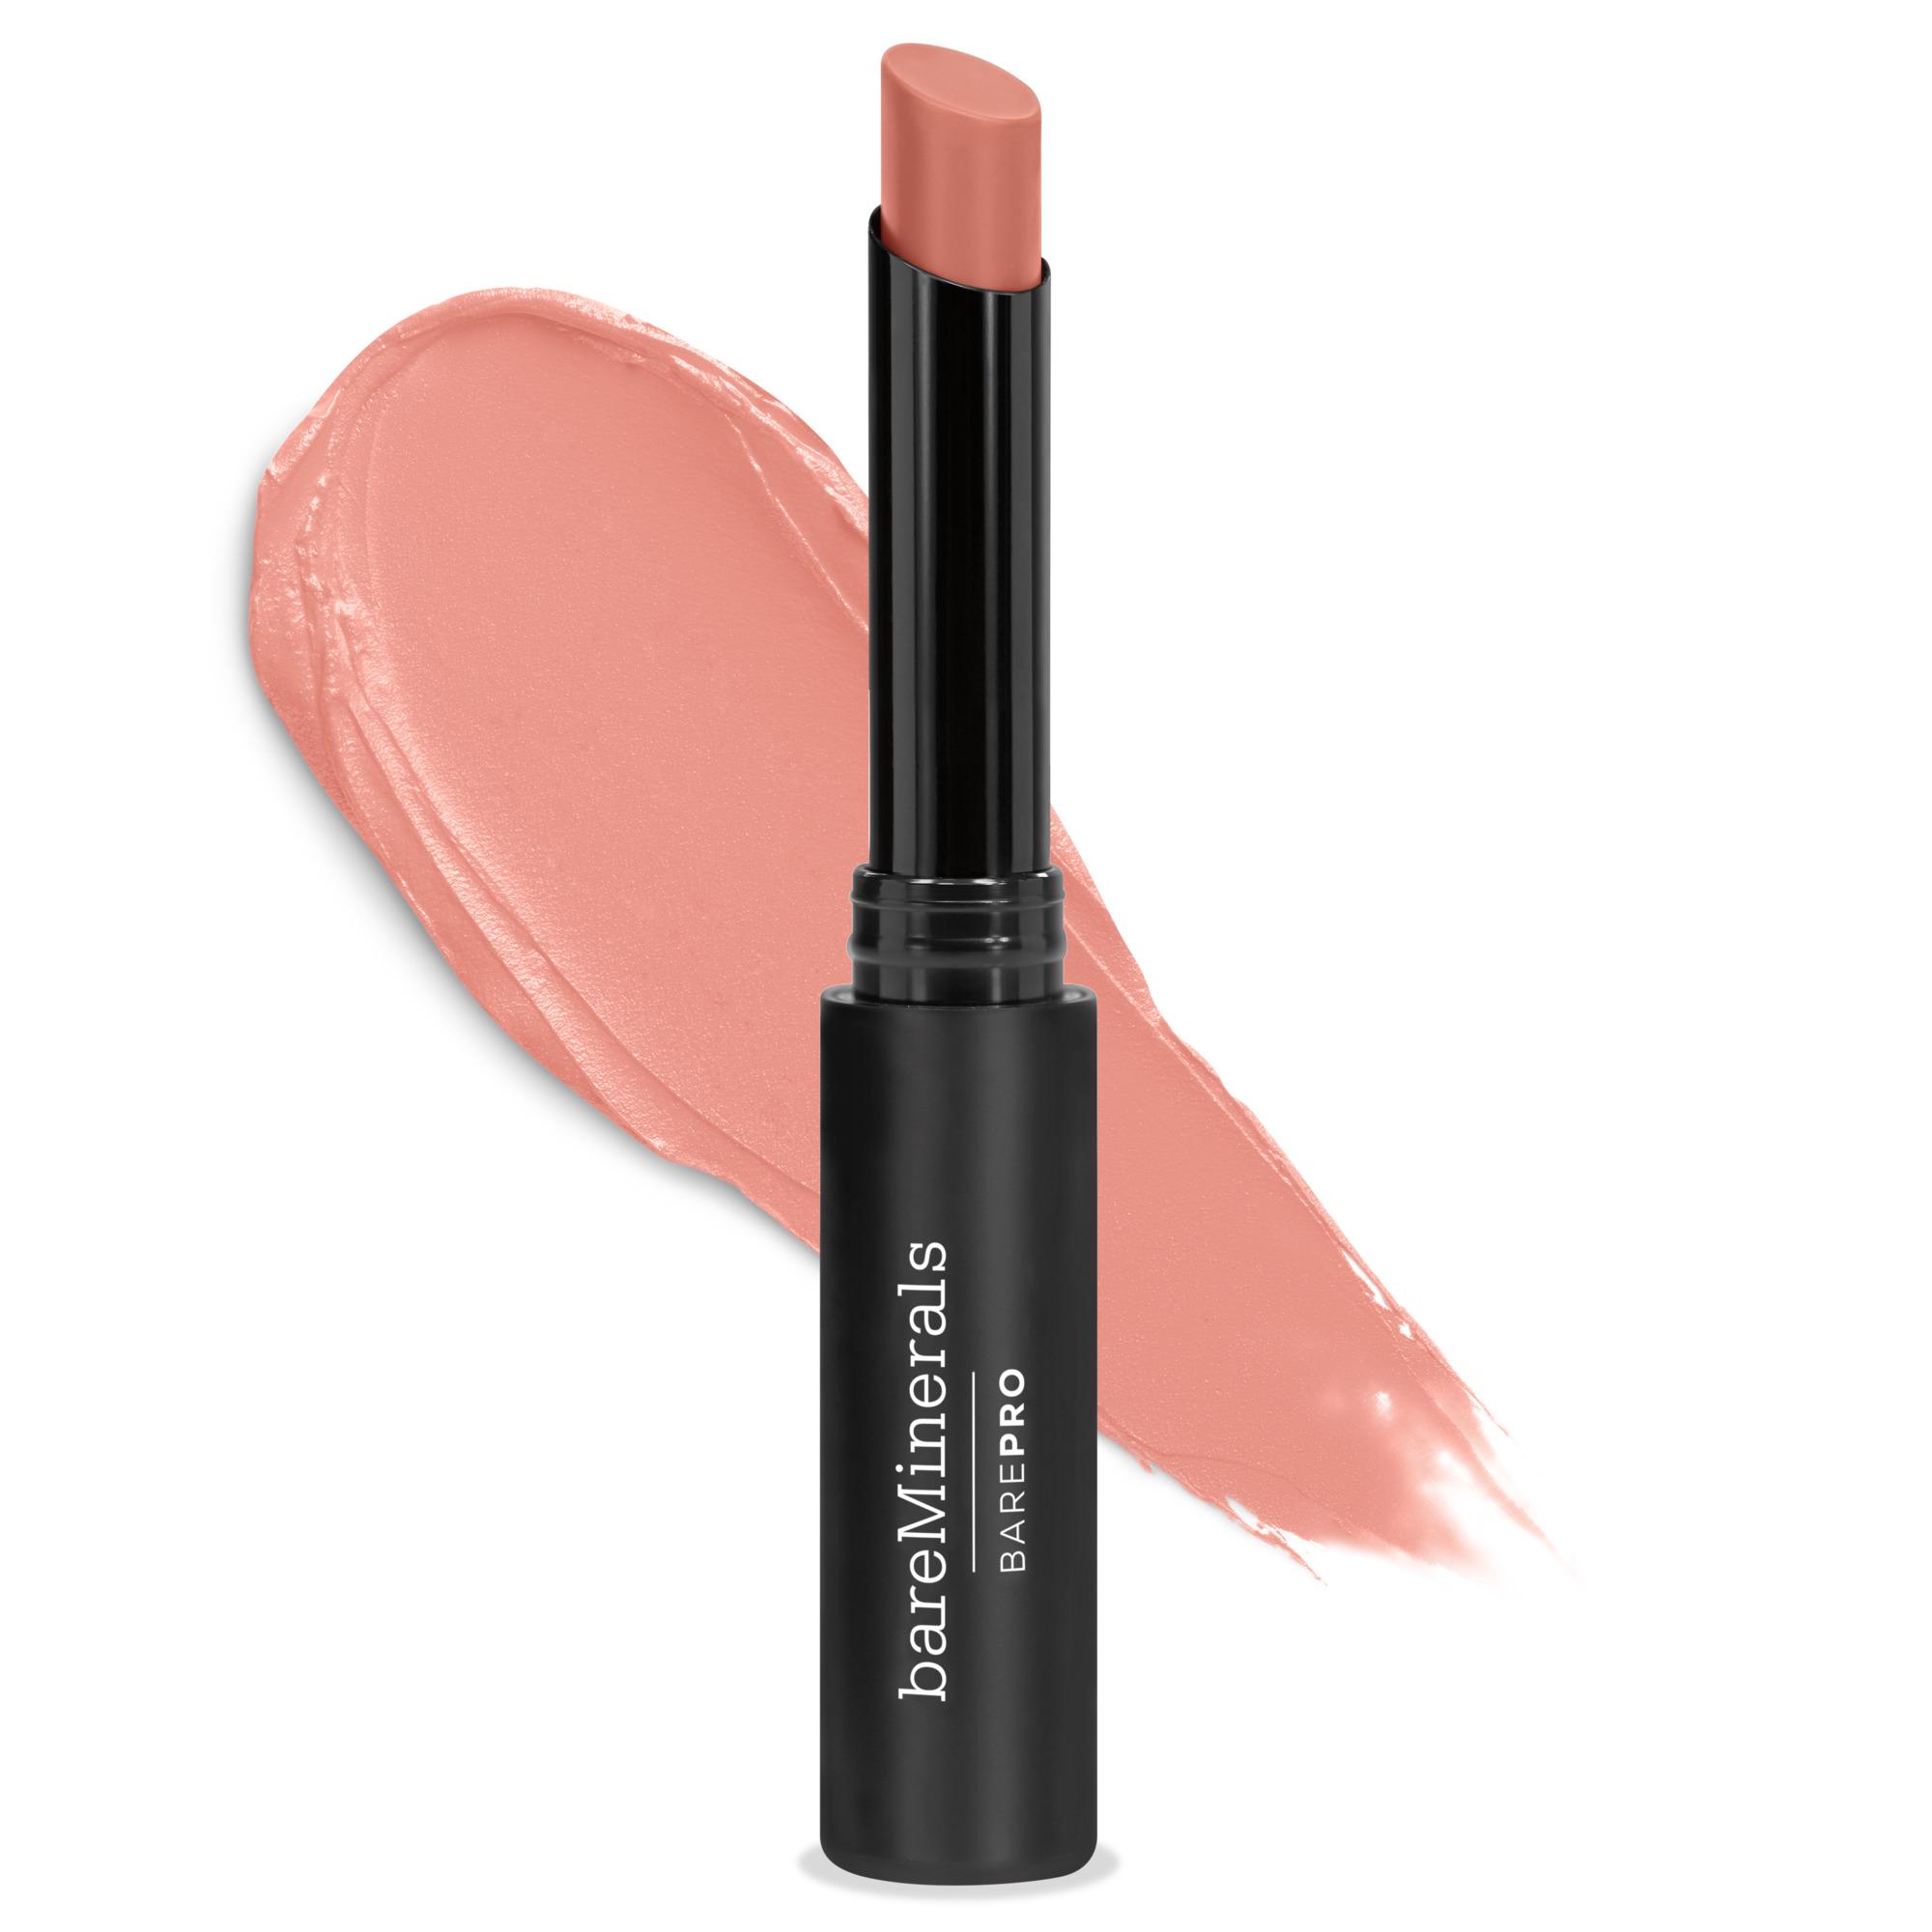 summer lipsticks 2019